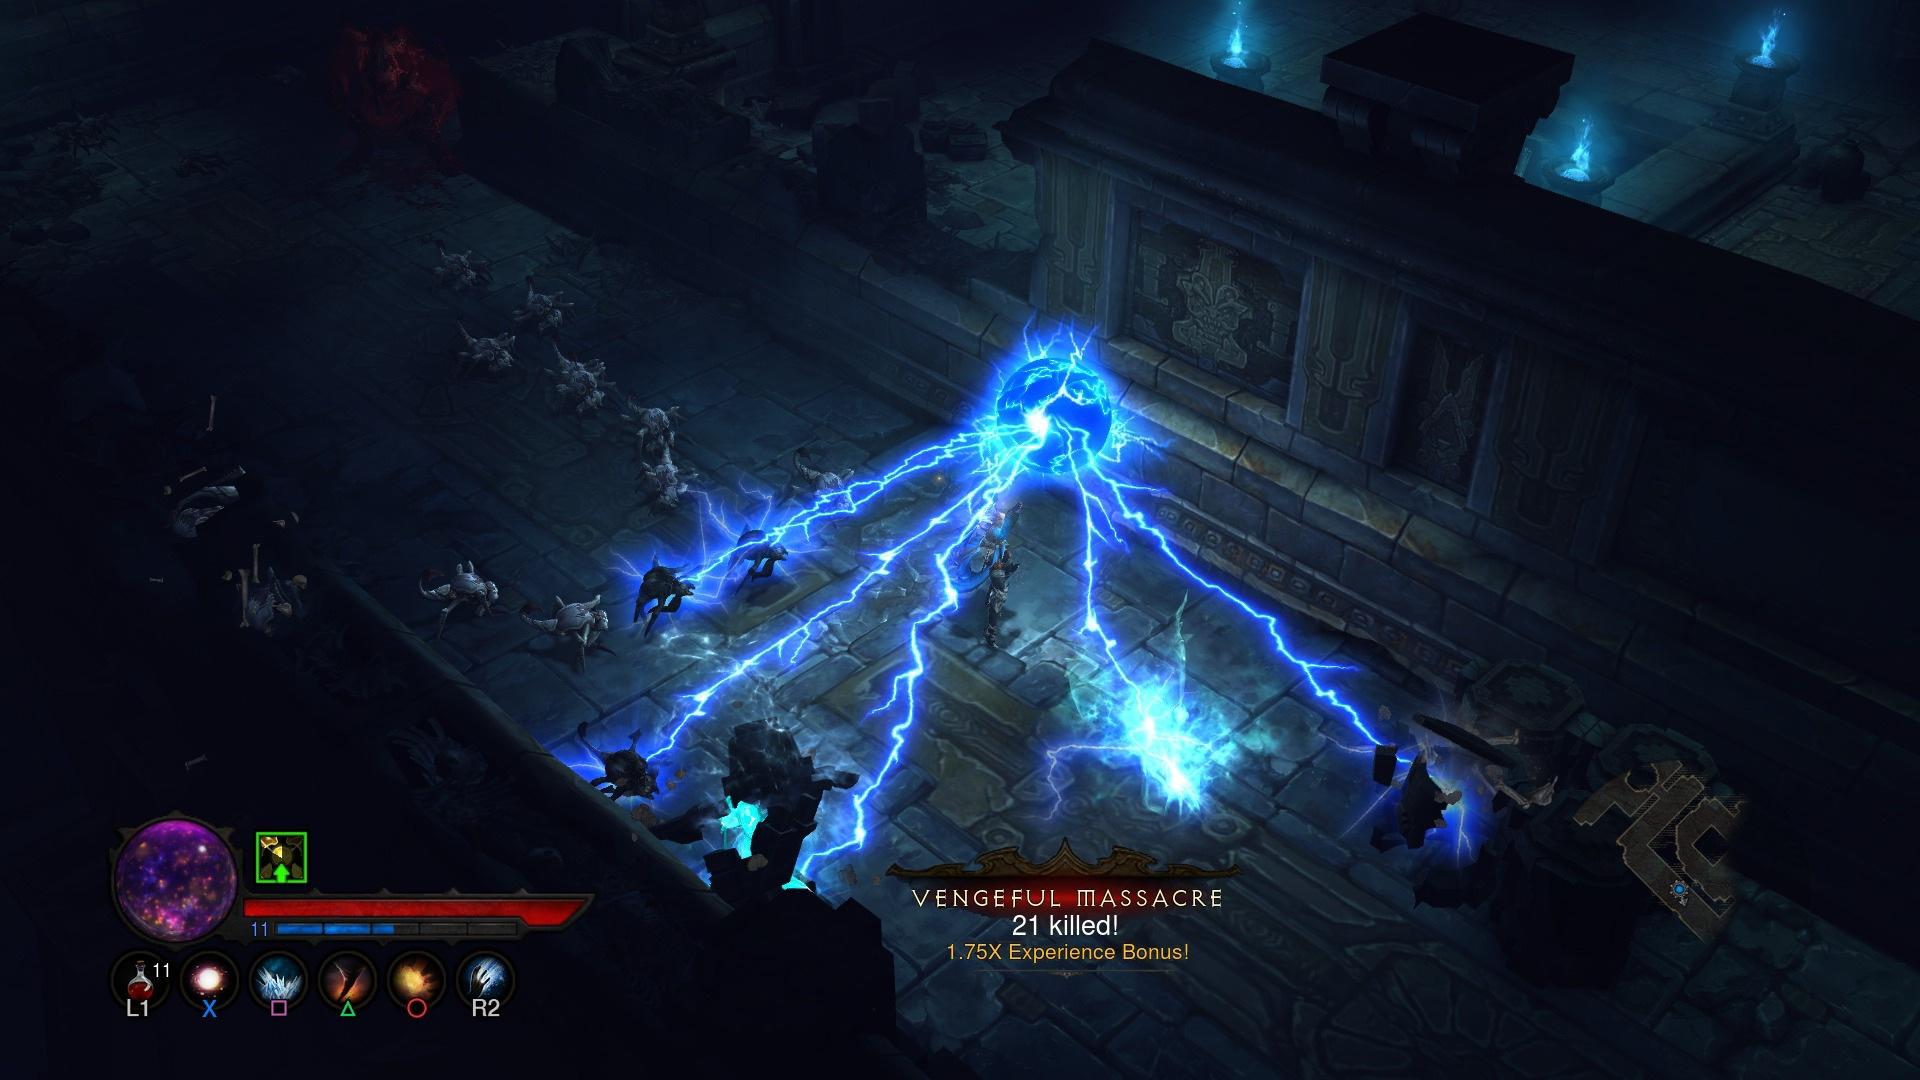 Diablo III Reaper of Souls: Ultimate Evil Edition on PS4